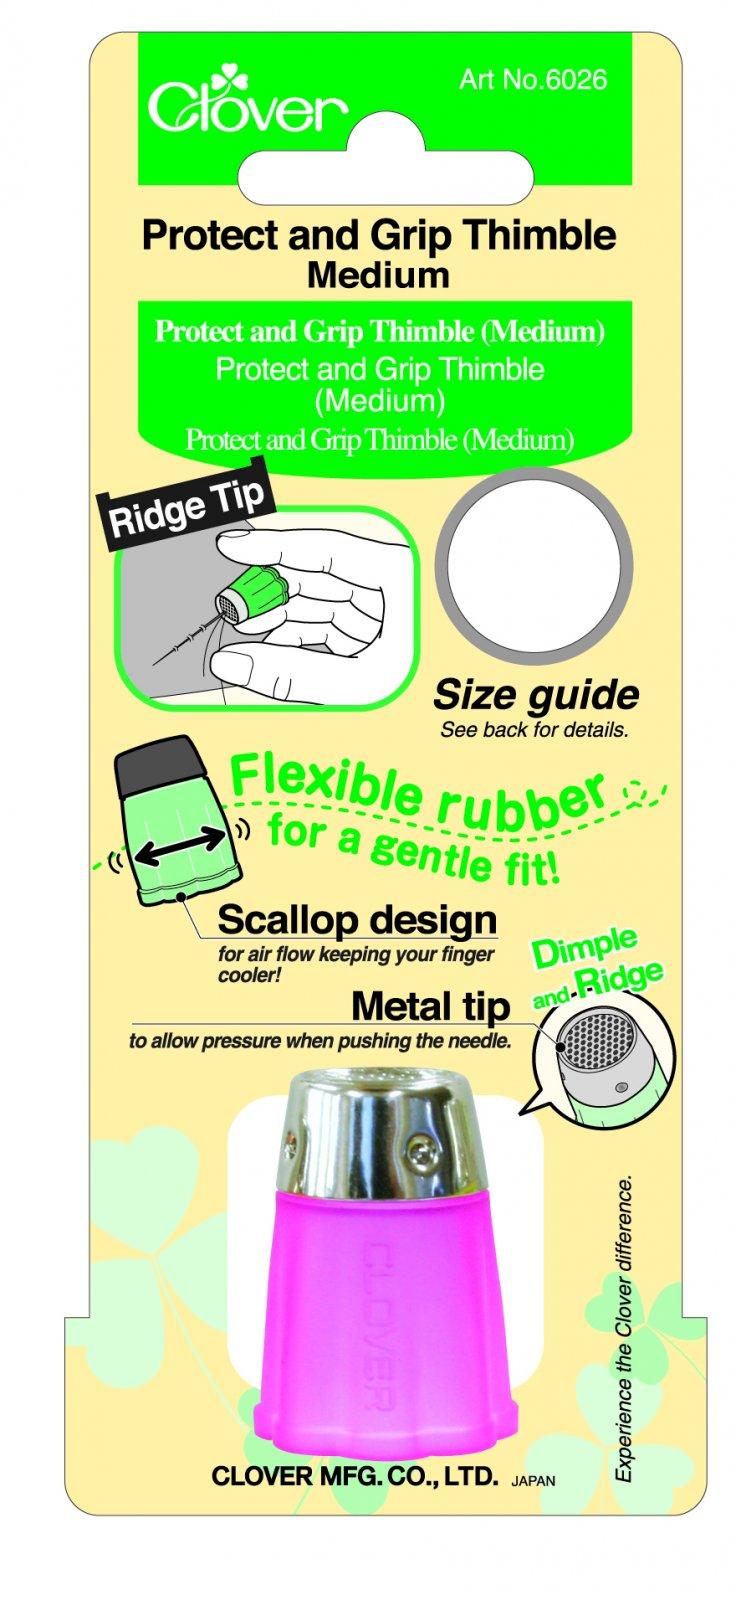 Protect and Grip Thimble (Medium)